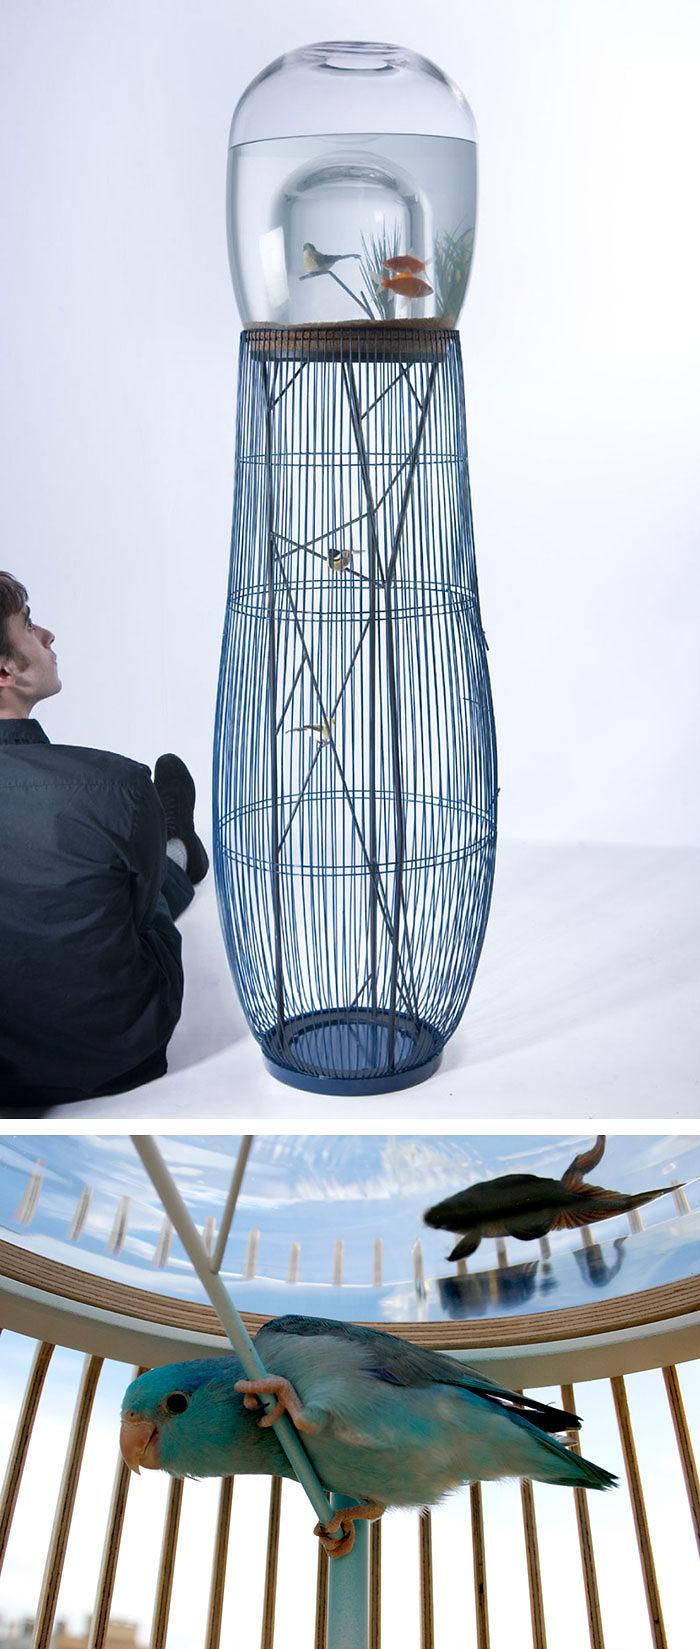 AD-Creative-Gift-Ideas-For-Bird-Lovers-17